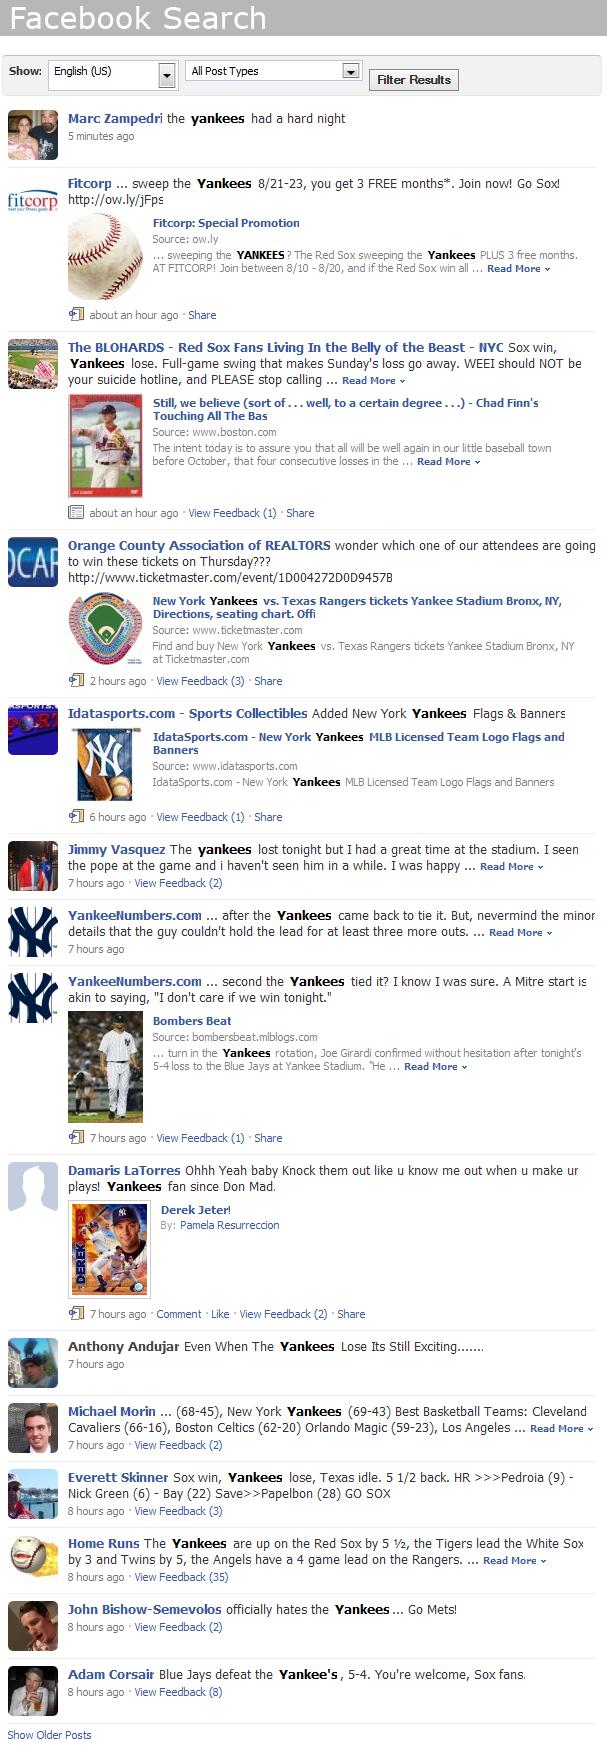 Ignite Social Media Agency | Facebook Search vs Twitter